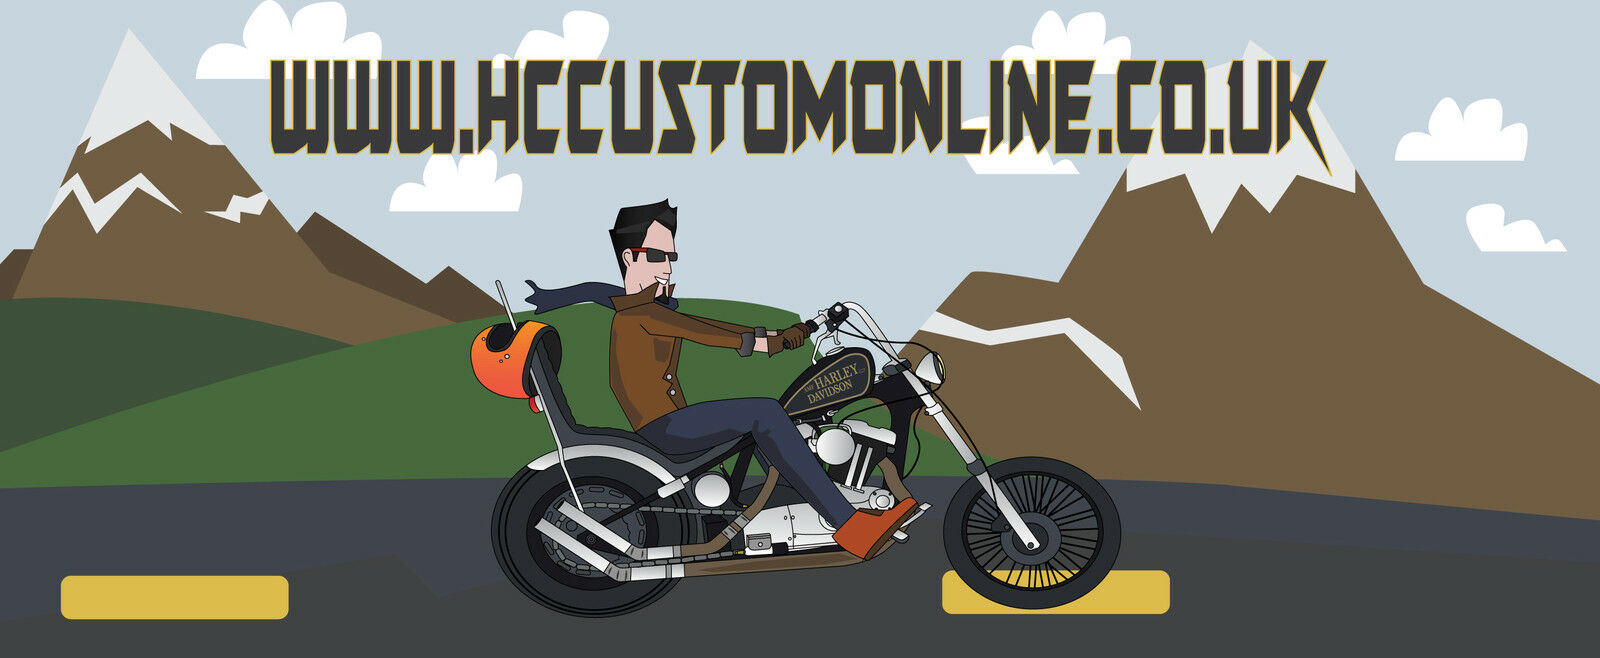 H&C Custom